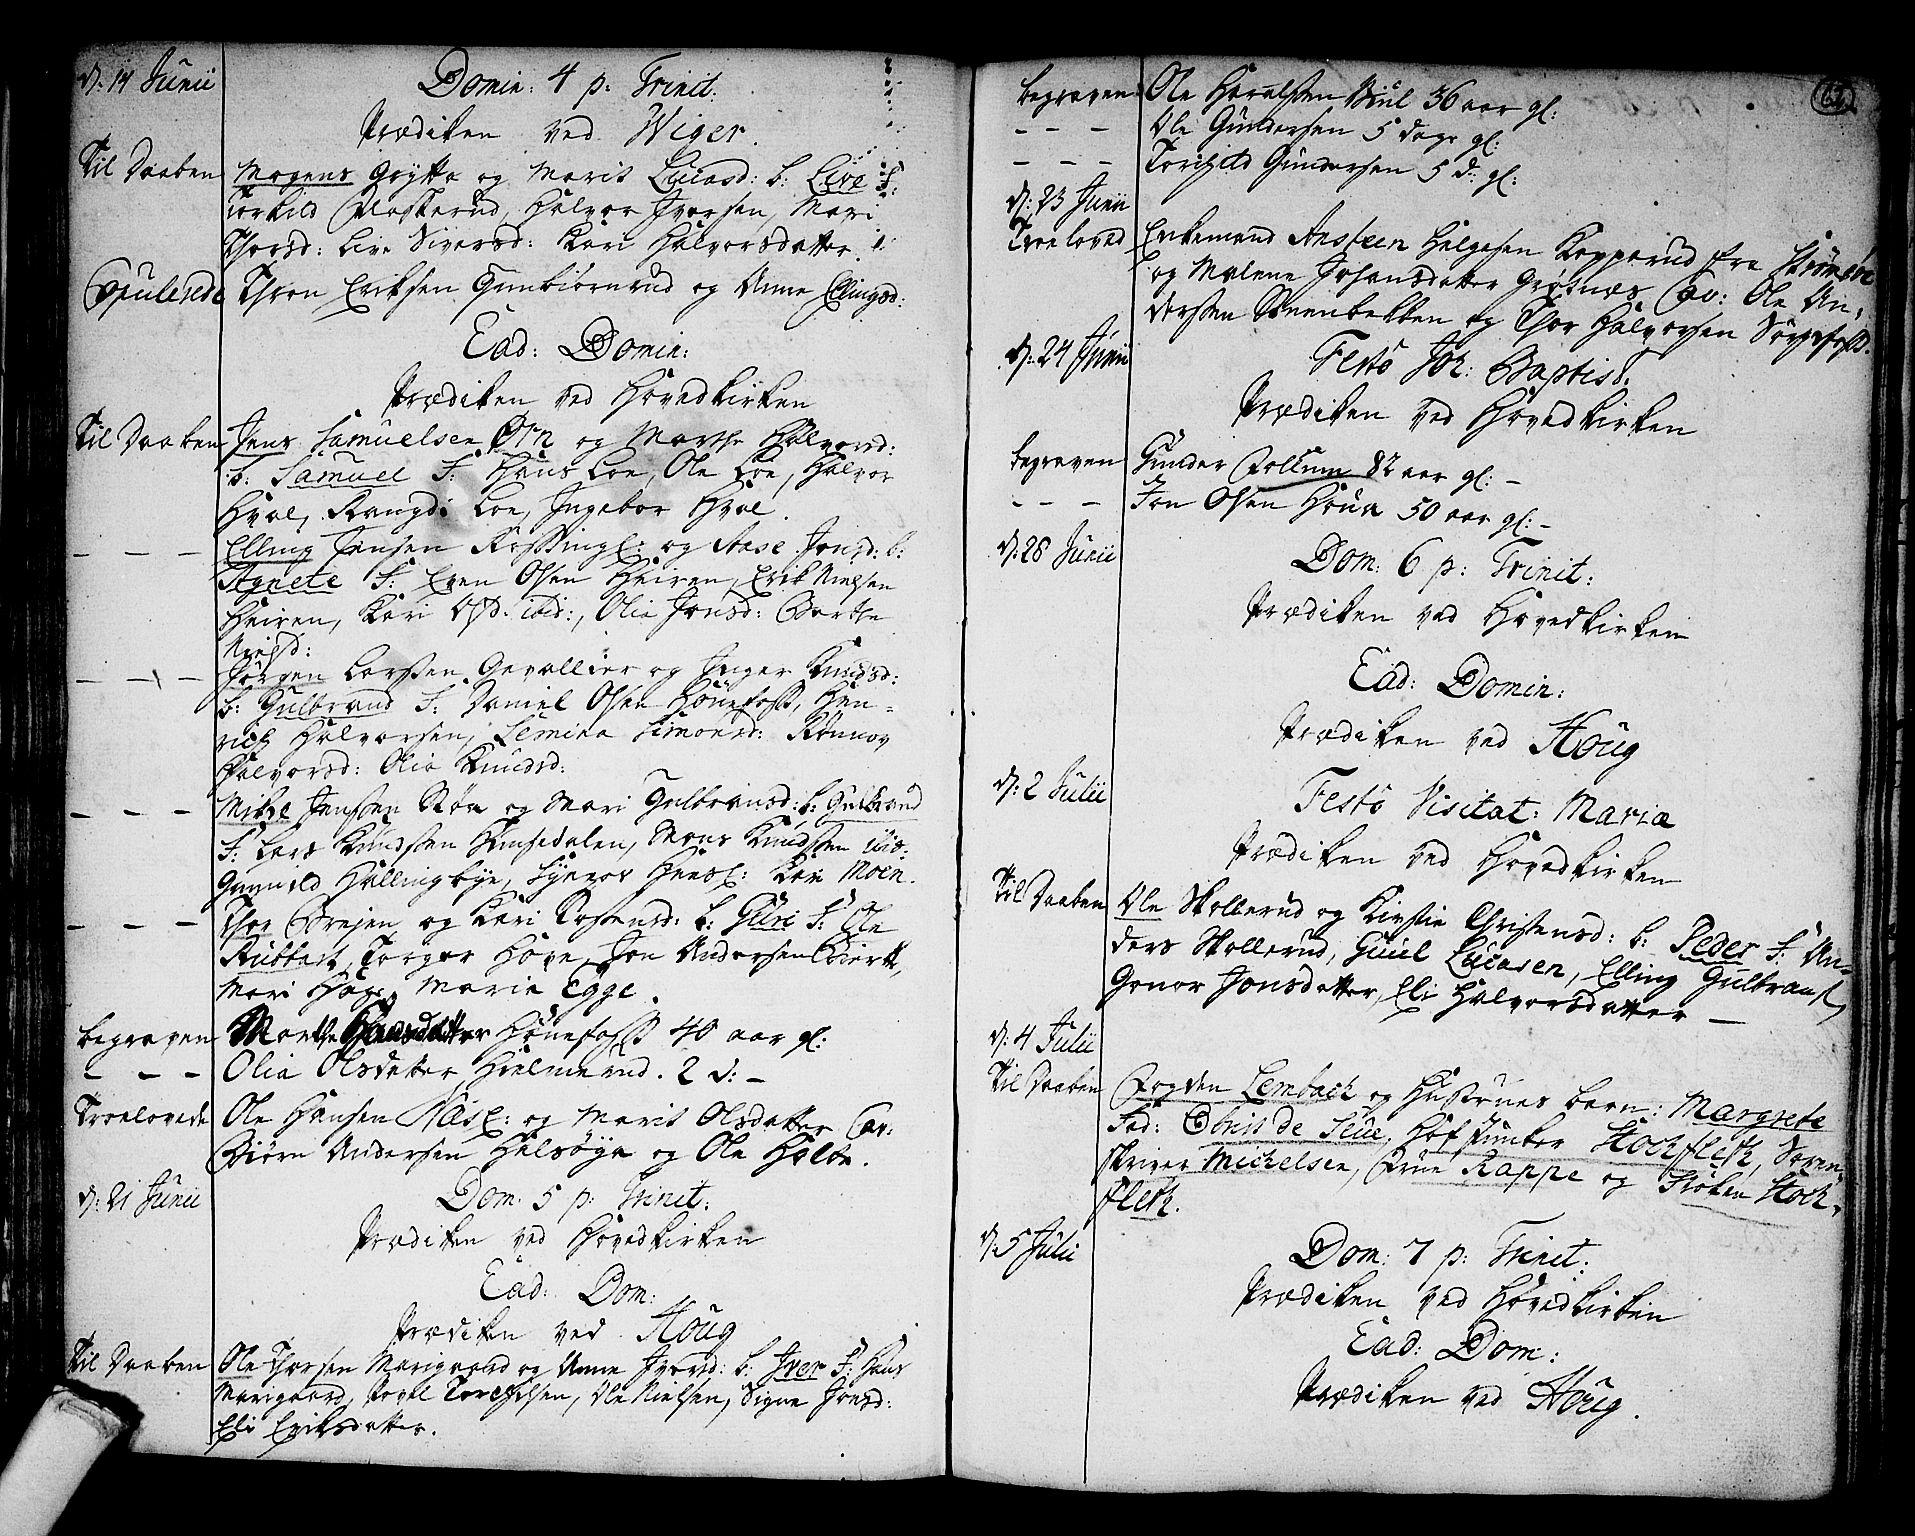 SAKO, Norderhov kirkebøker, F/Fa/L0004: Parish register (official) no. 4, 1758-1774, p. 62